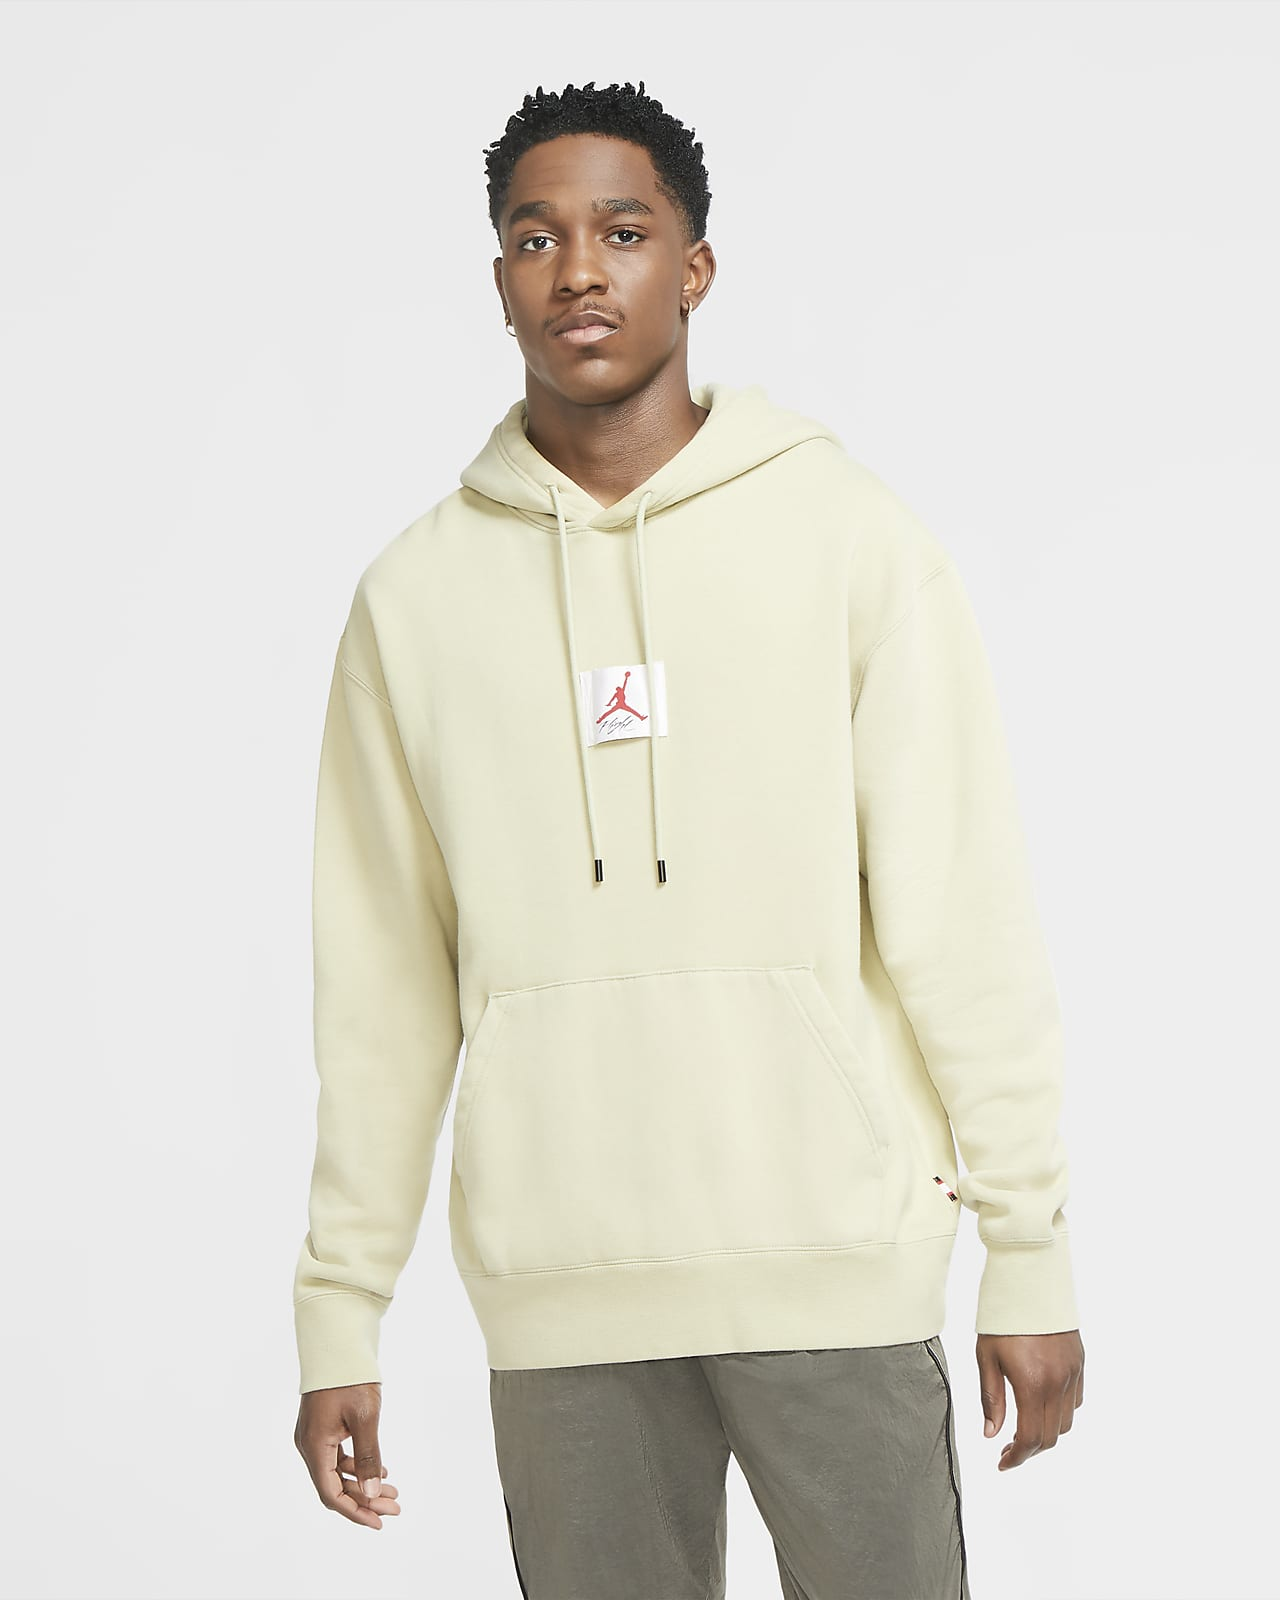 Fleece Pullover Hoodie. Nike CZ